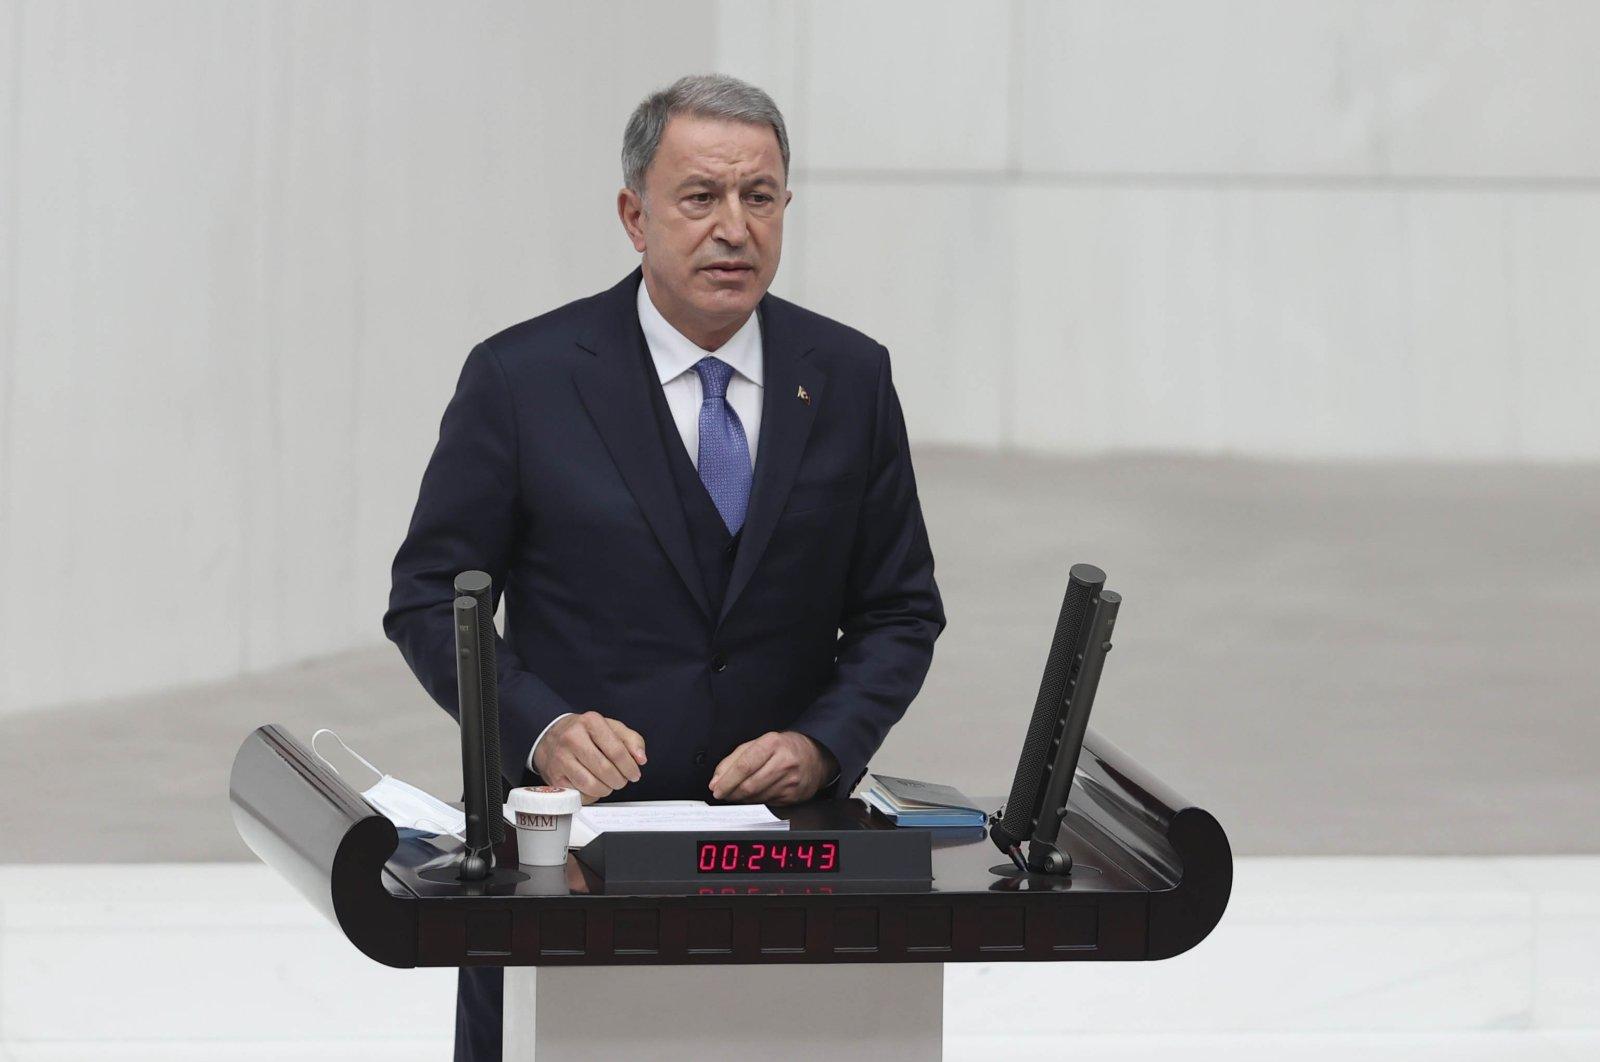 Defense Minister Hulusi Akar gives a speech at the Turkish parliament, Ankara, Dec. 9, 2020. (AA)